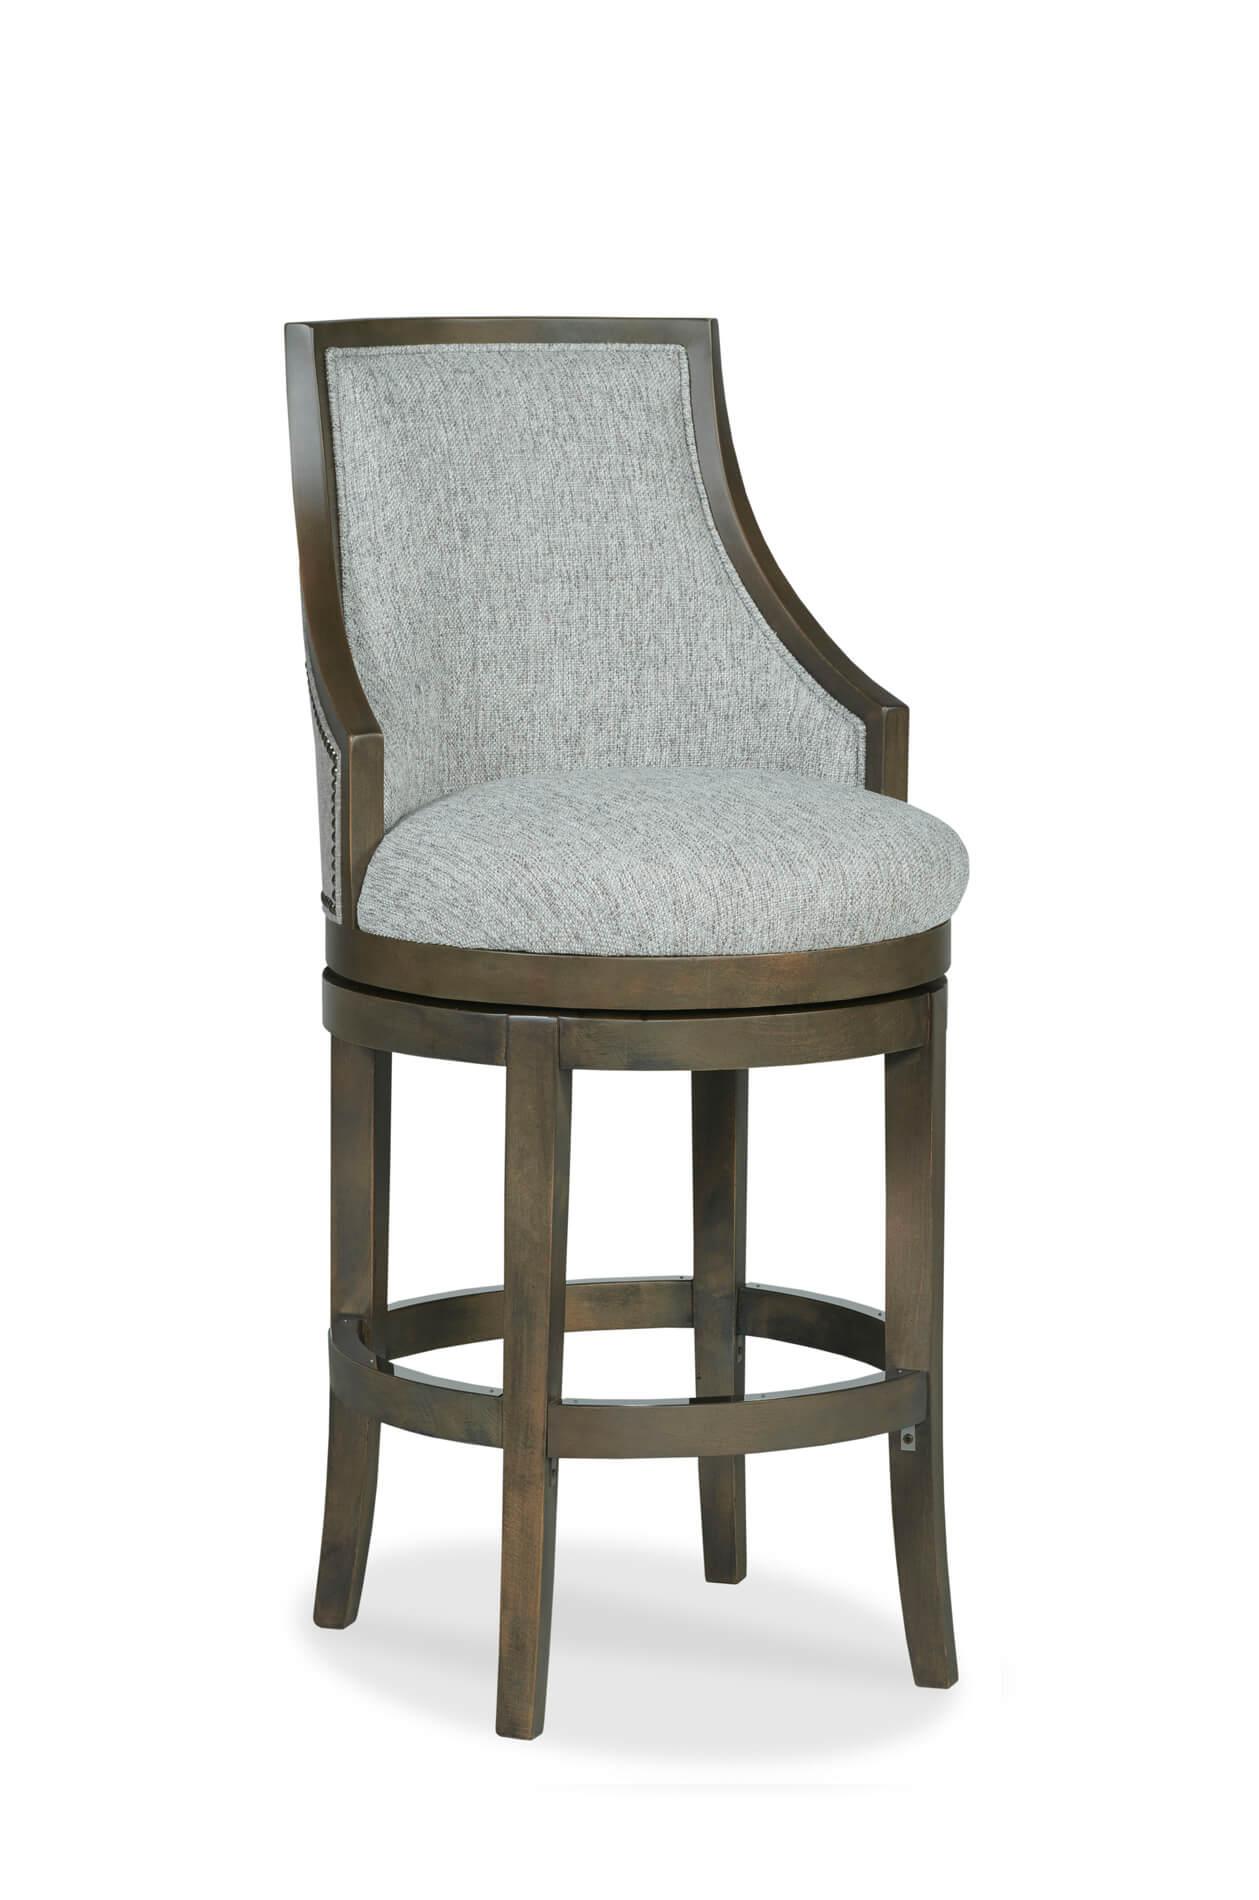 Buy Robroy Comfortable Upholstered Wood Swivel Stool